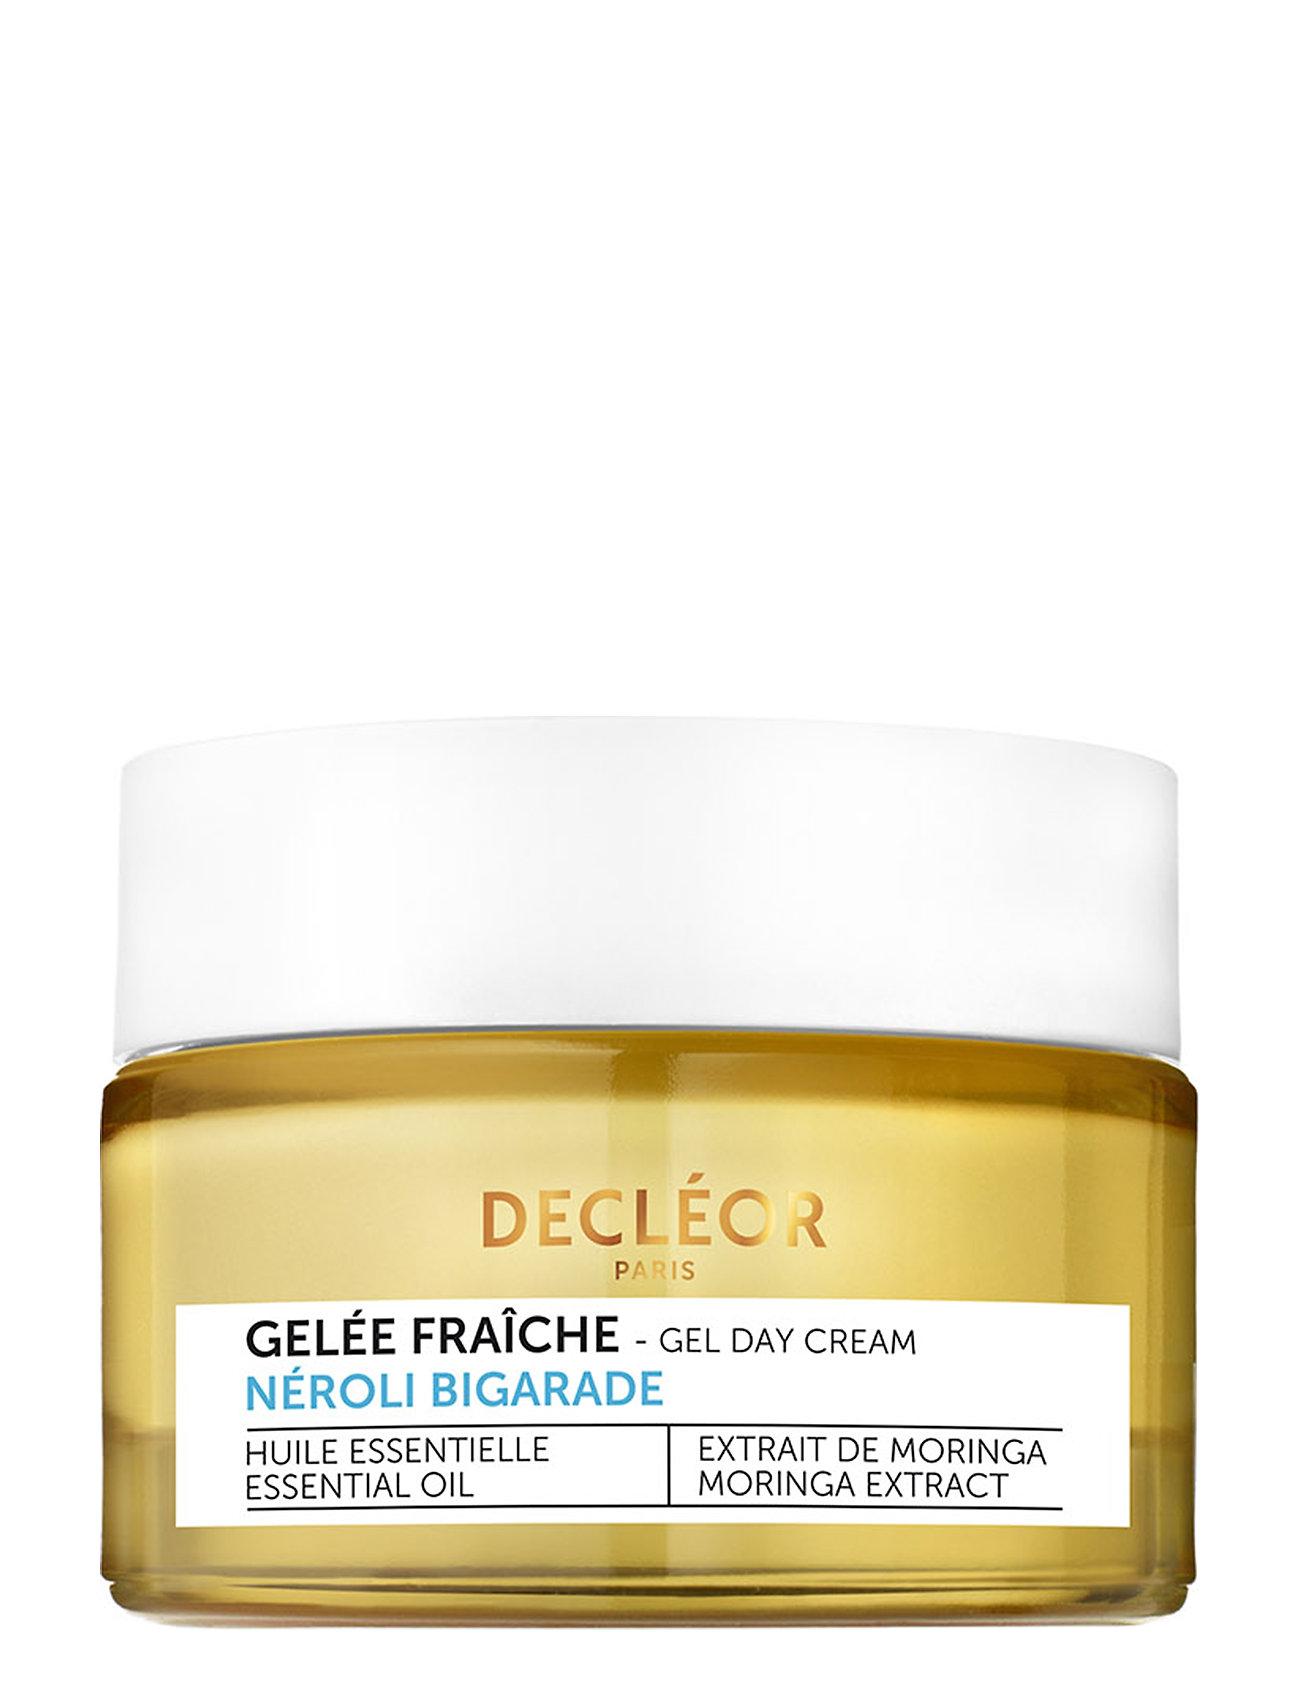 Decléor Neroli Bigarade Gel Day Cream - CLEAR